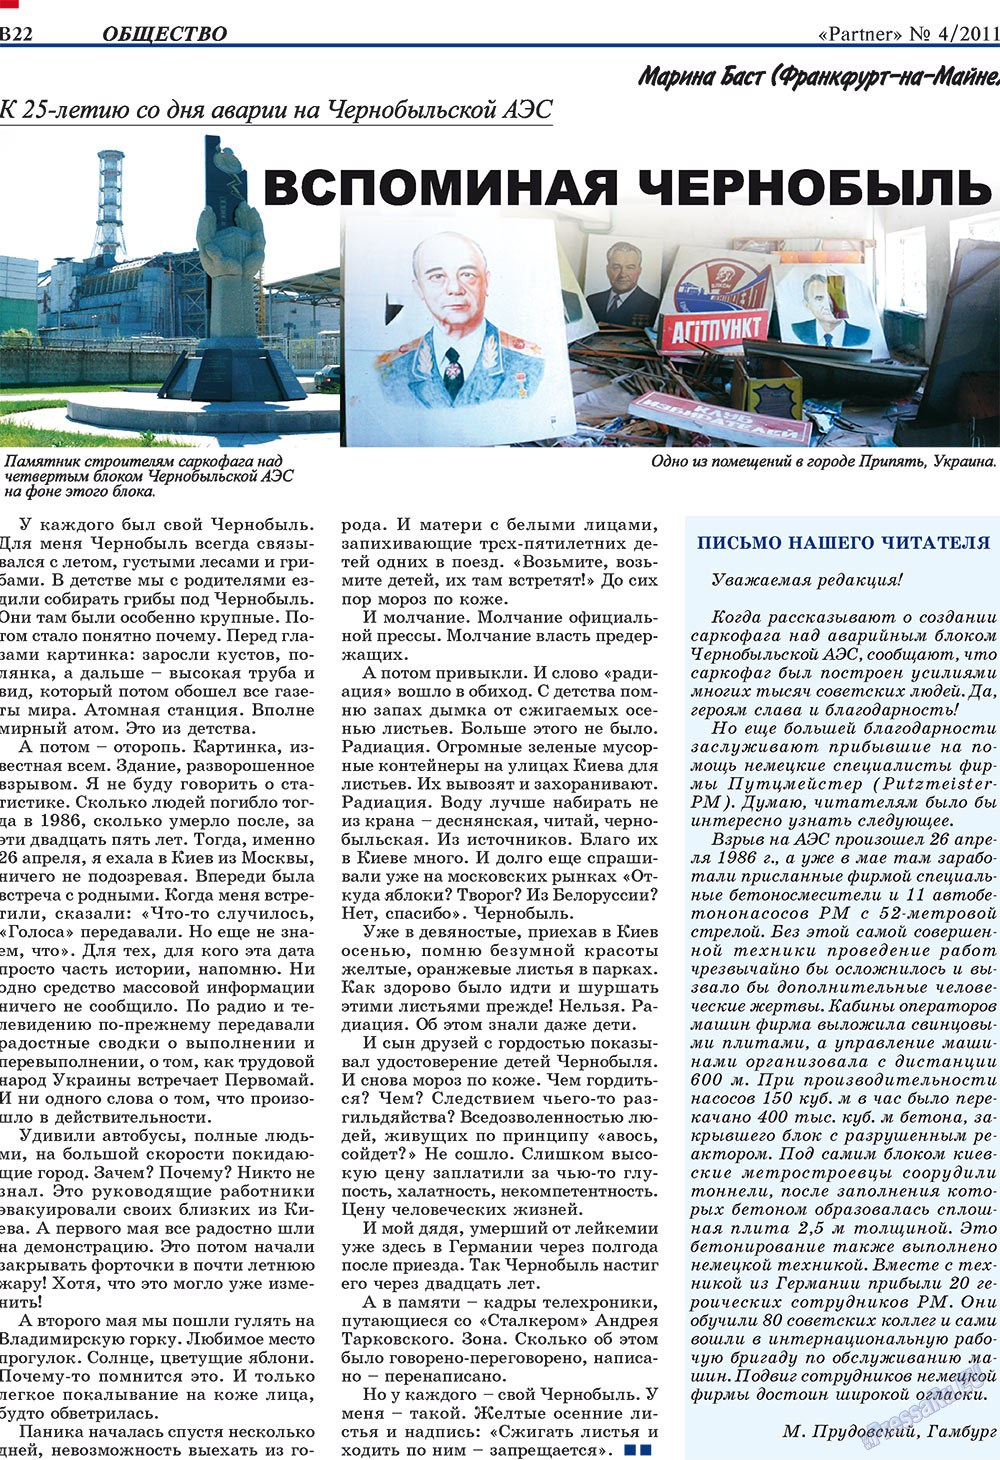 Партнер-север (журнал). 2011 год, номер 4, стр. 32